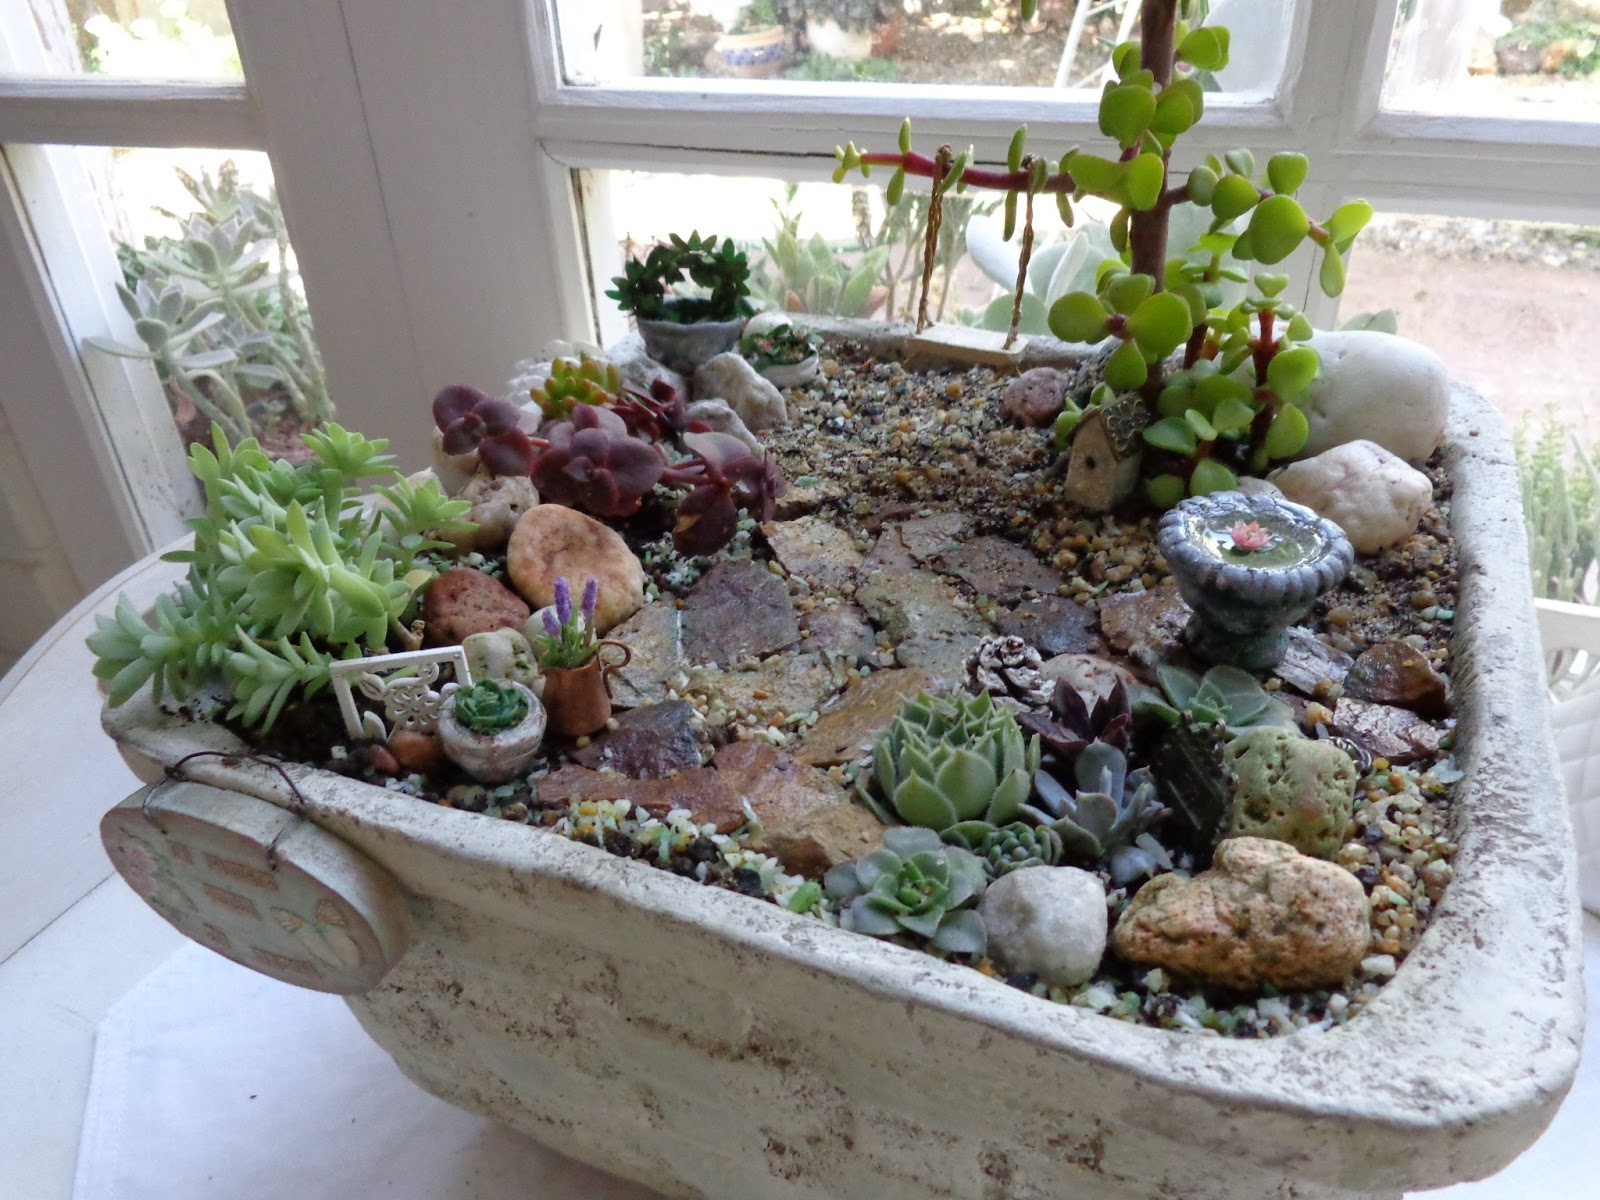 Teacup And Roses: Mi pequeño jardín